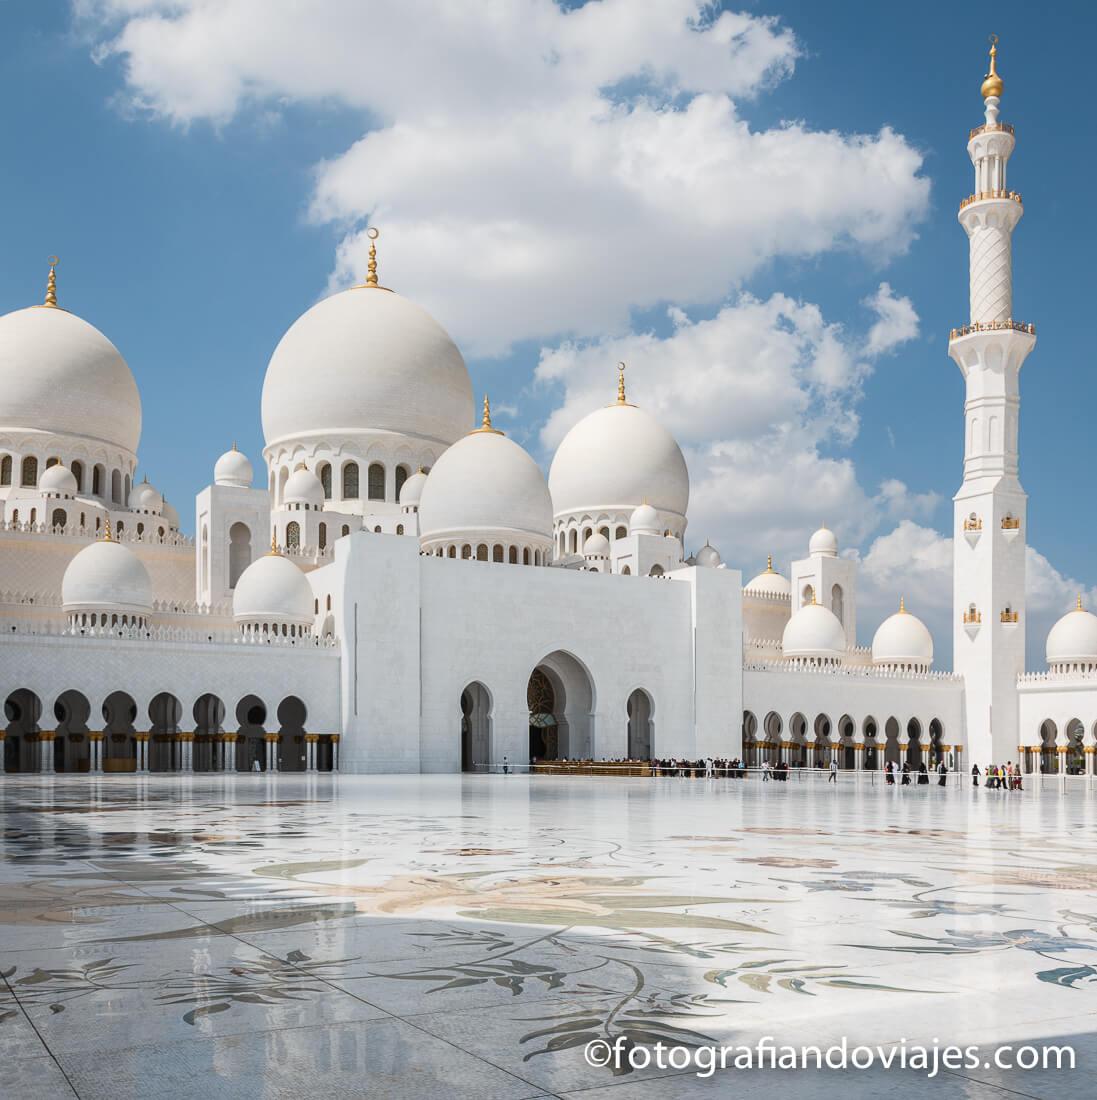 Gran mezquita Sheikh Zayed en Abu Dhabi